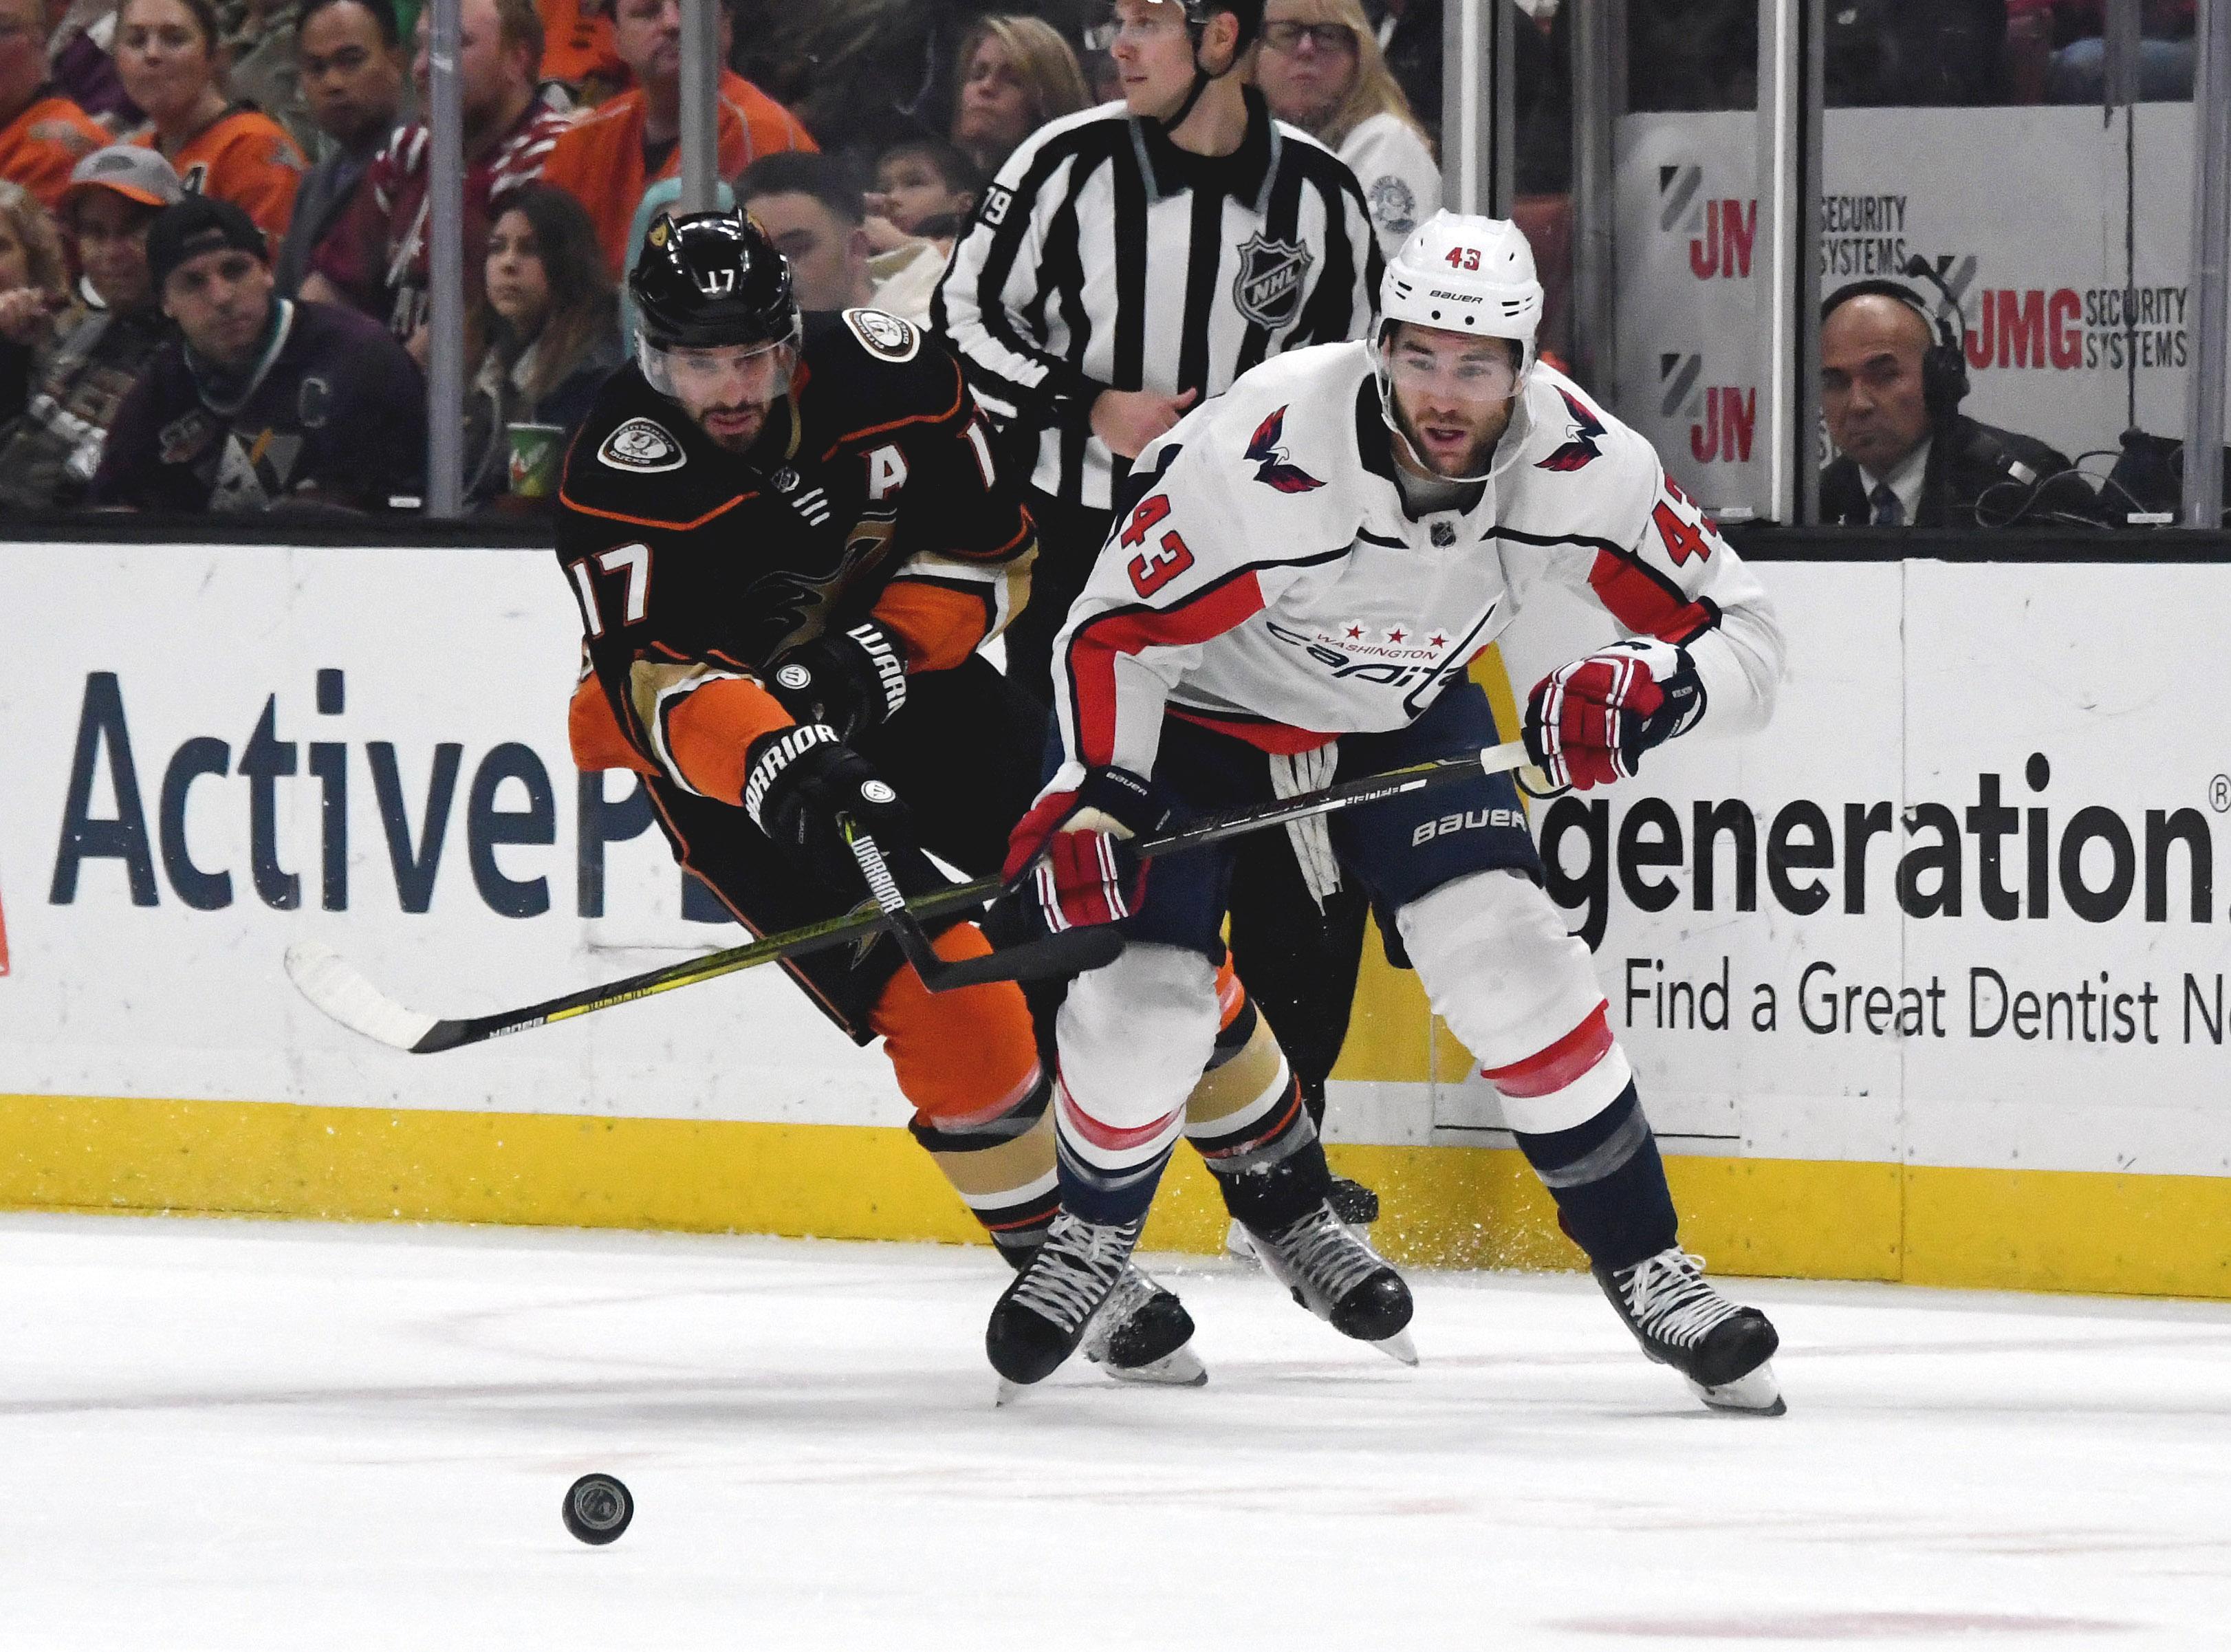 NHL: Washington Capitals at Anaheim Ducks